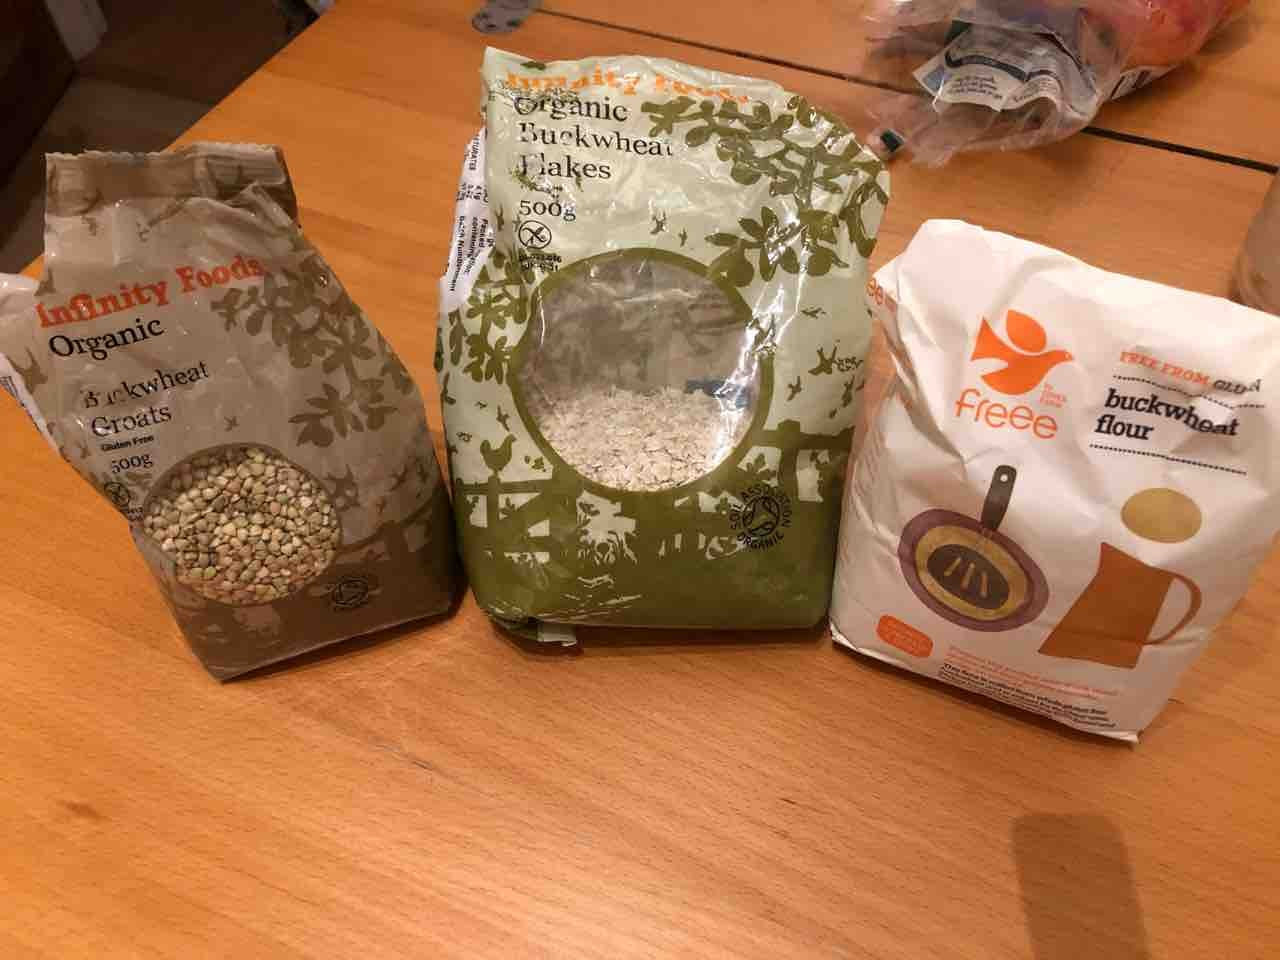 Buckwheat flour, flakes and groats